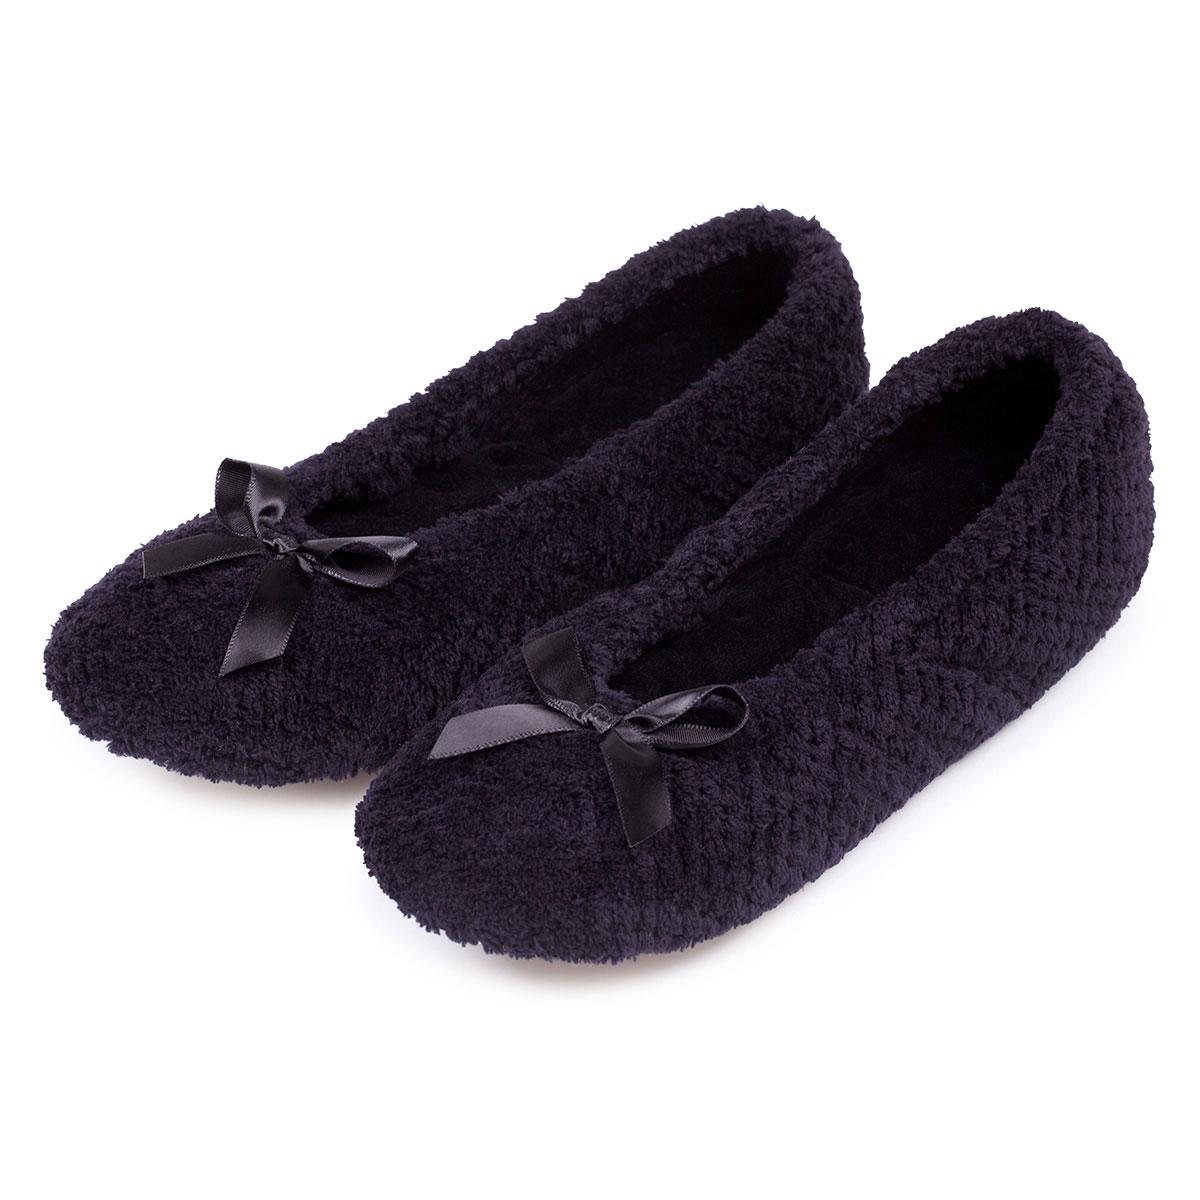 76436ba4a6894 Isotoner Ladies Popcorn Ballet Slippers